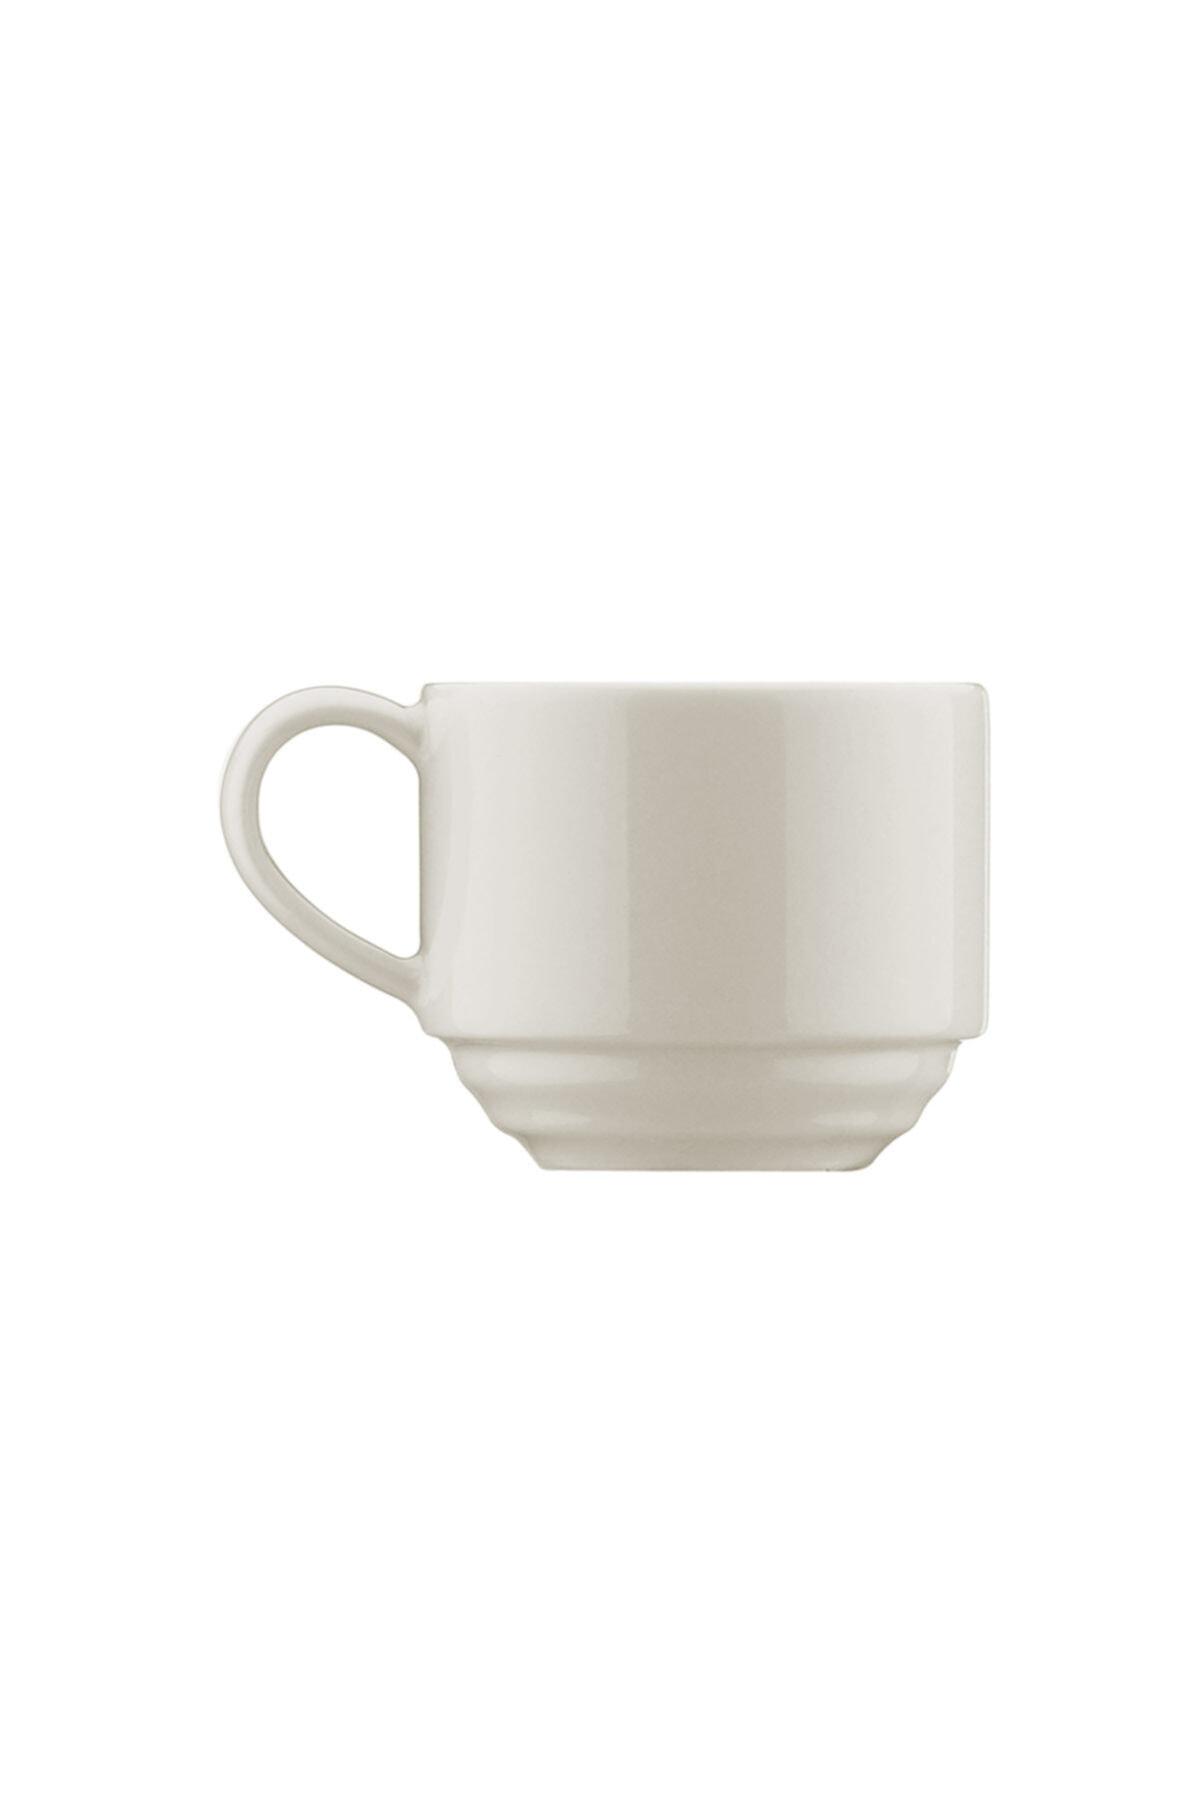 Kütahya Porselen Tuvana Kahve Takımı Krem 2